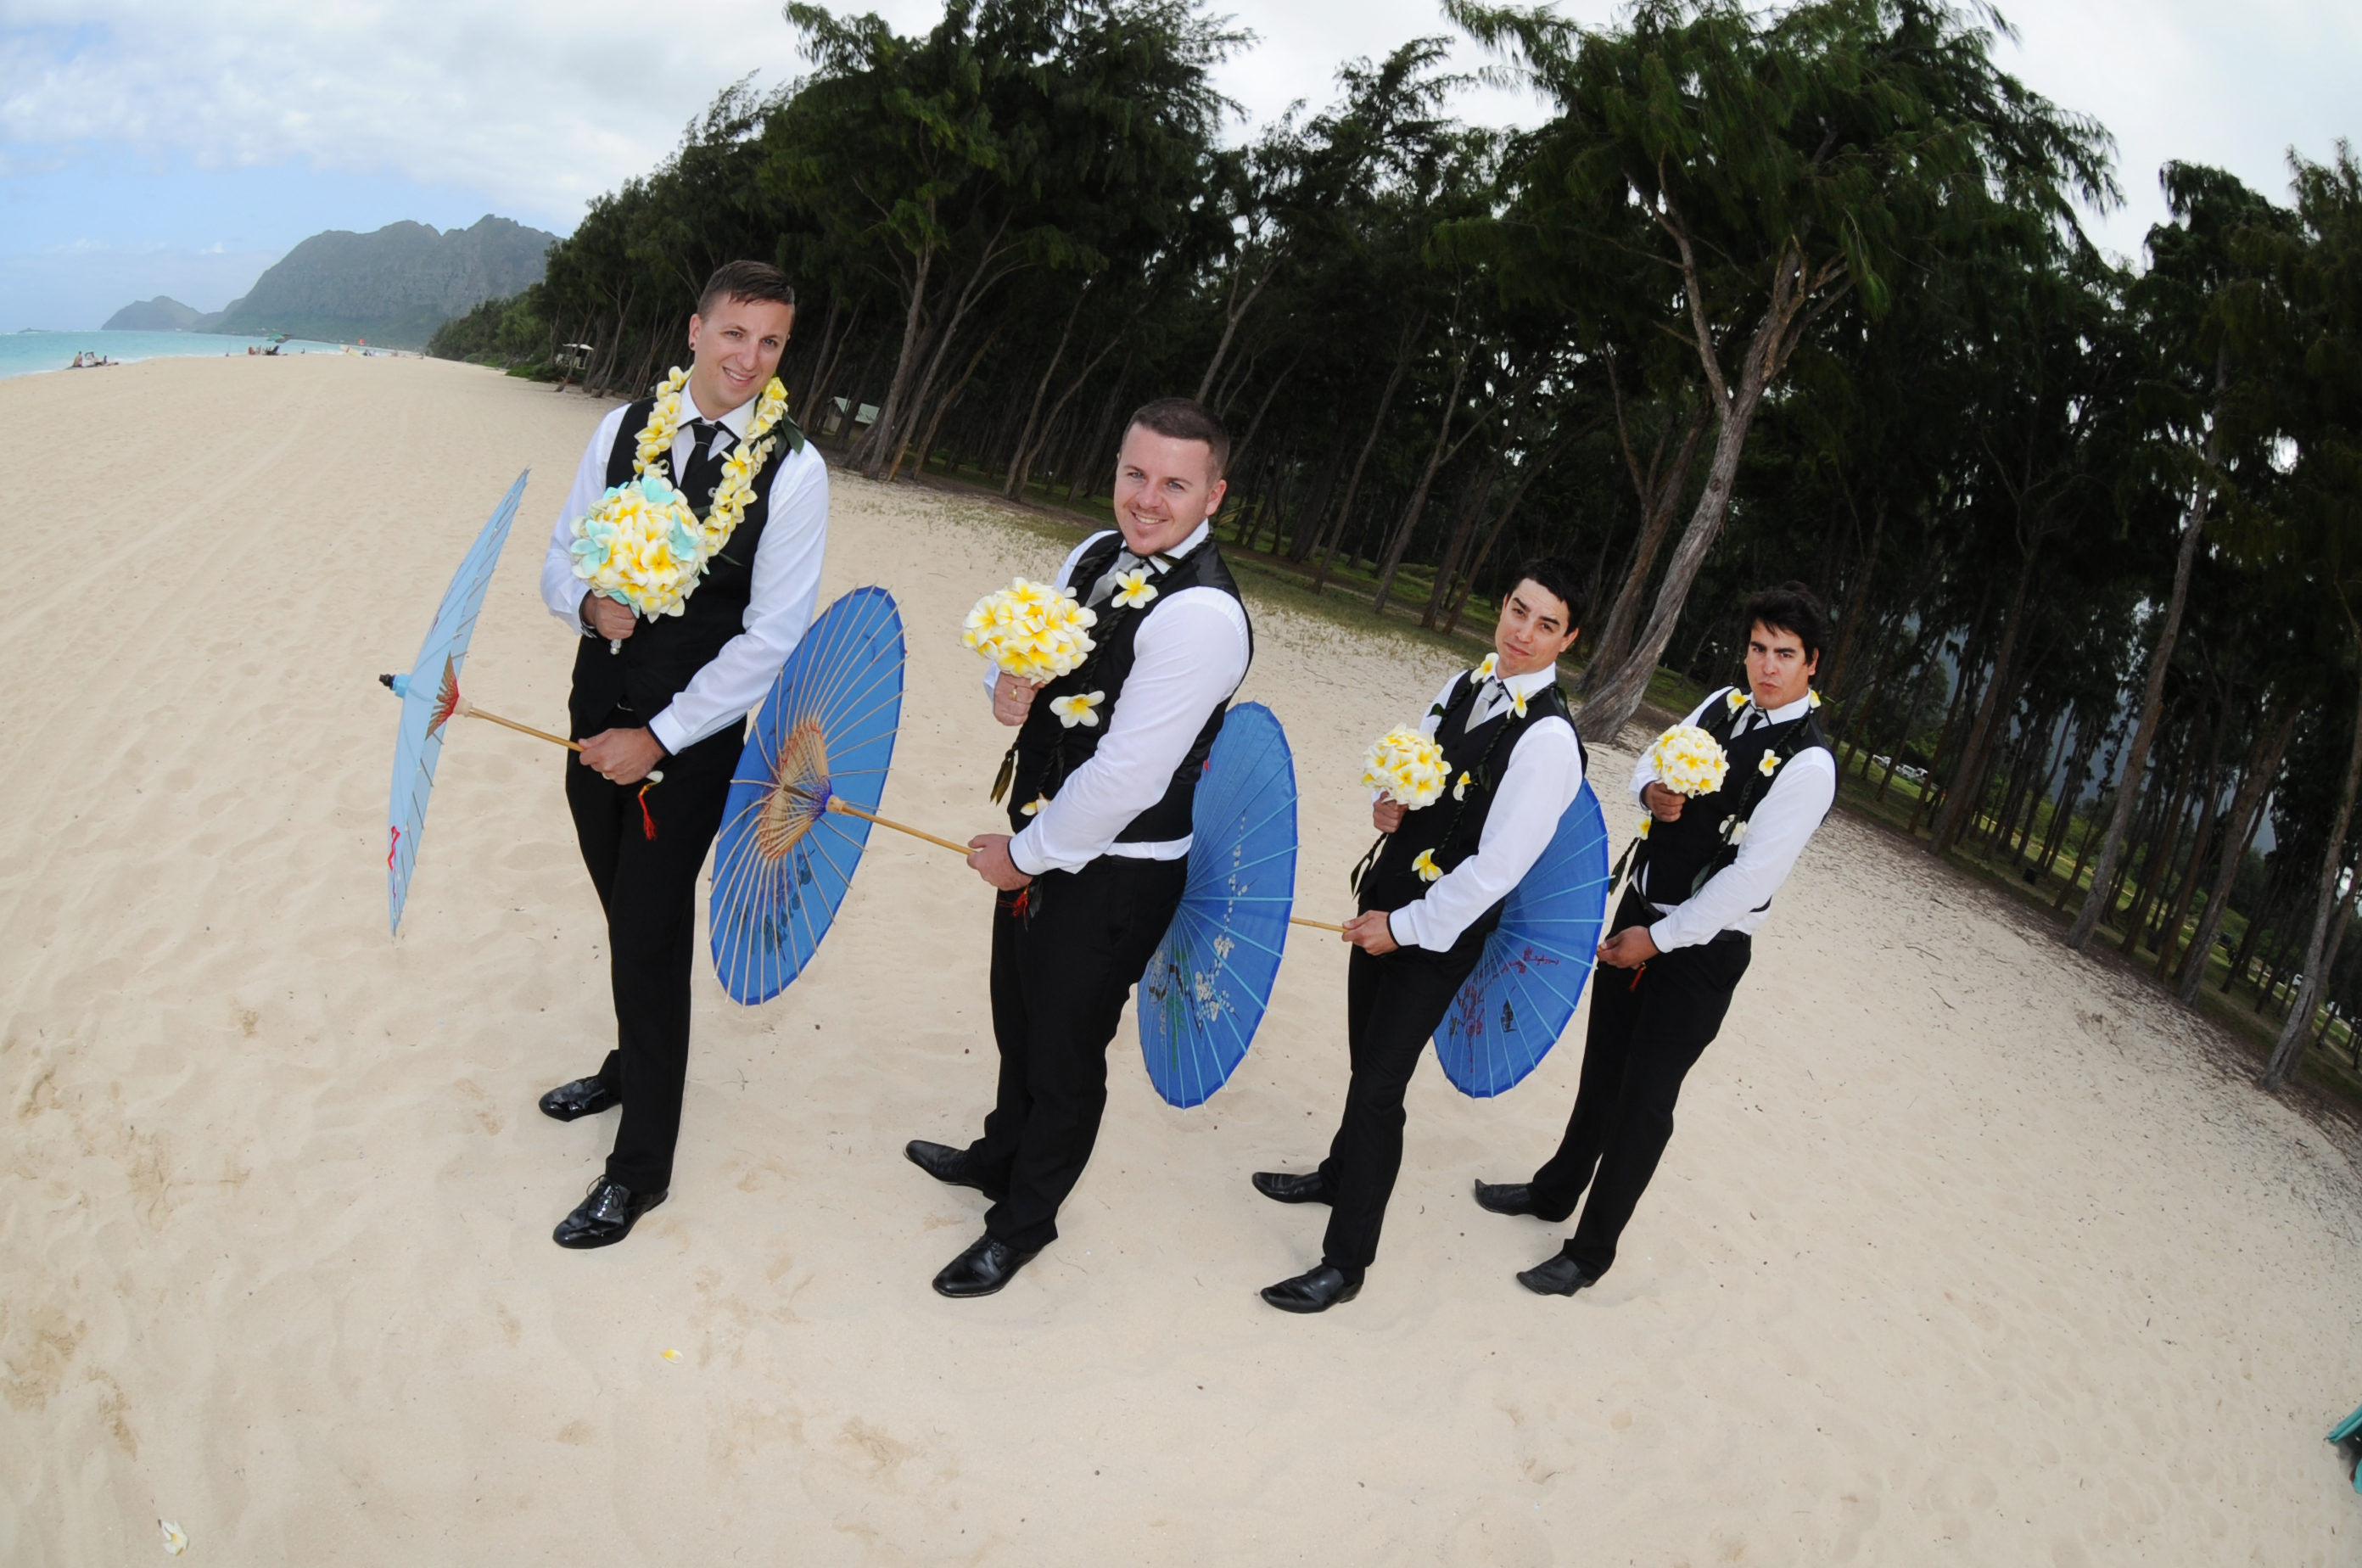 Alohaislandweddings.com- Wedding Picture in Hawaii-11